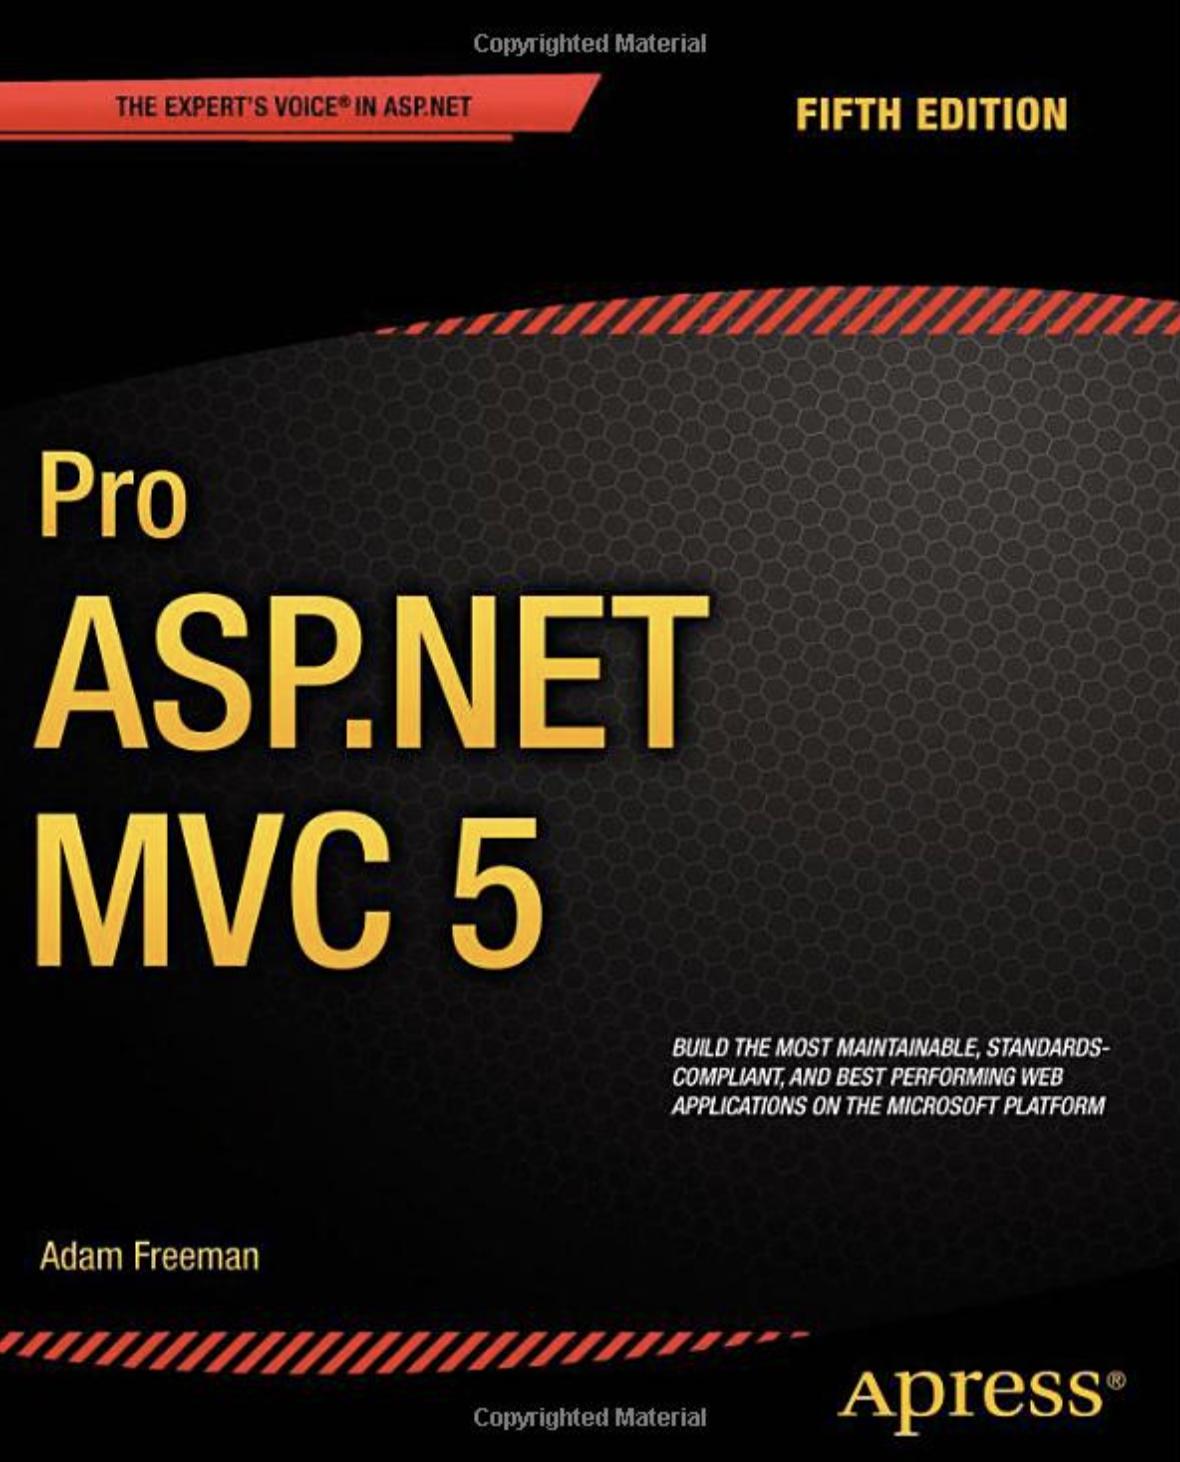 Cover of Pro ASP.NET MVC 5